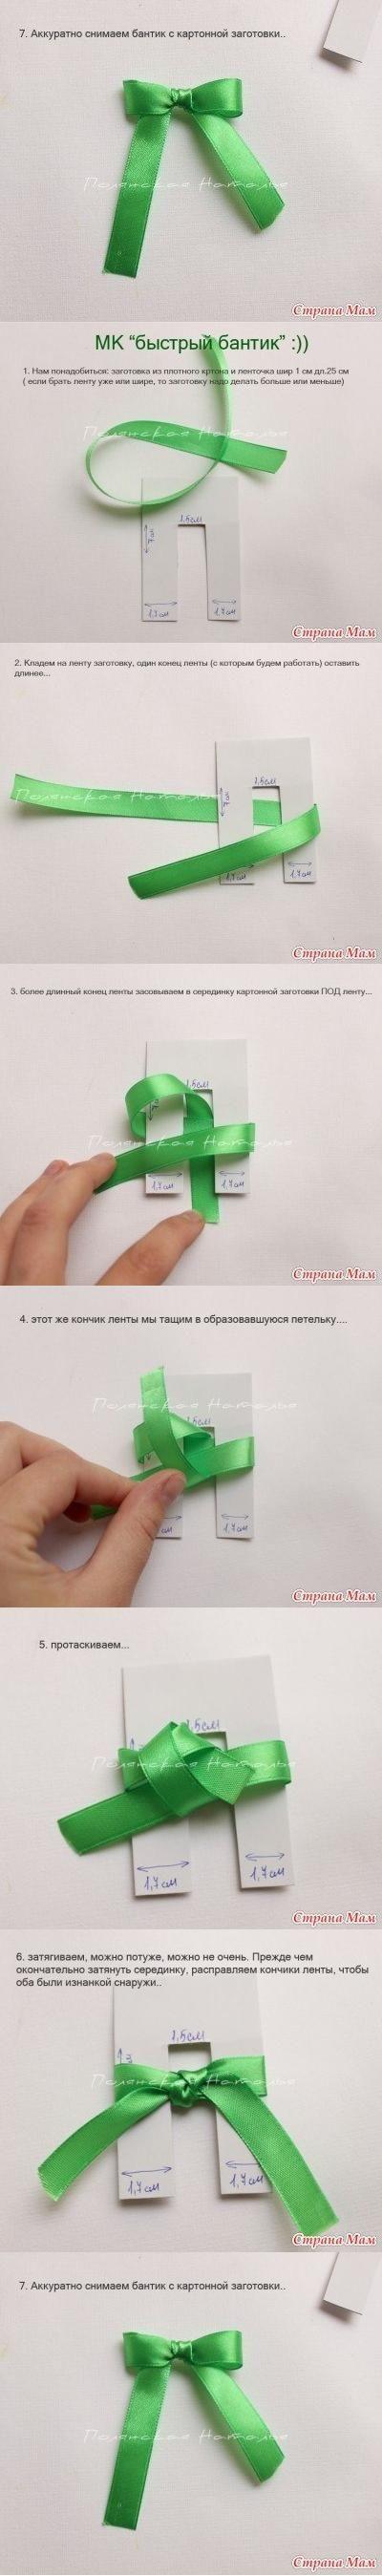 DIY Easy Ribbon Bow: